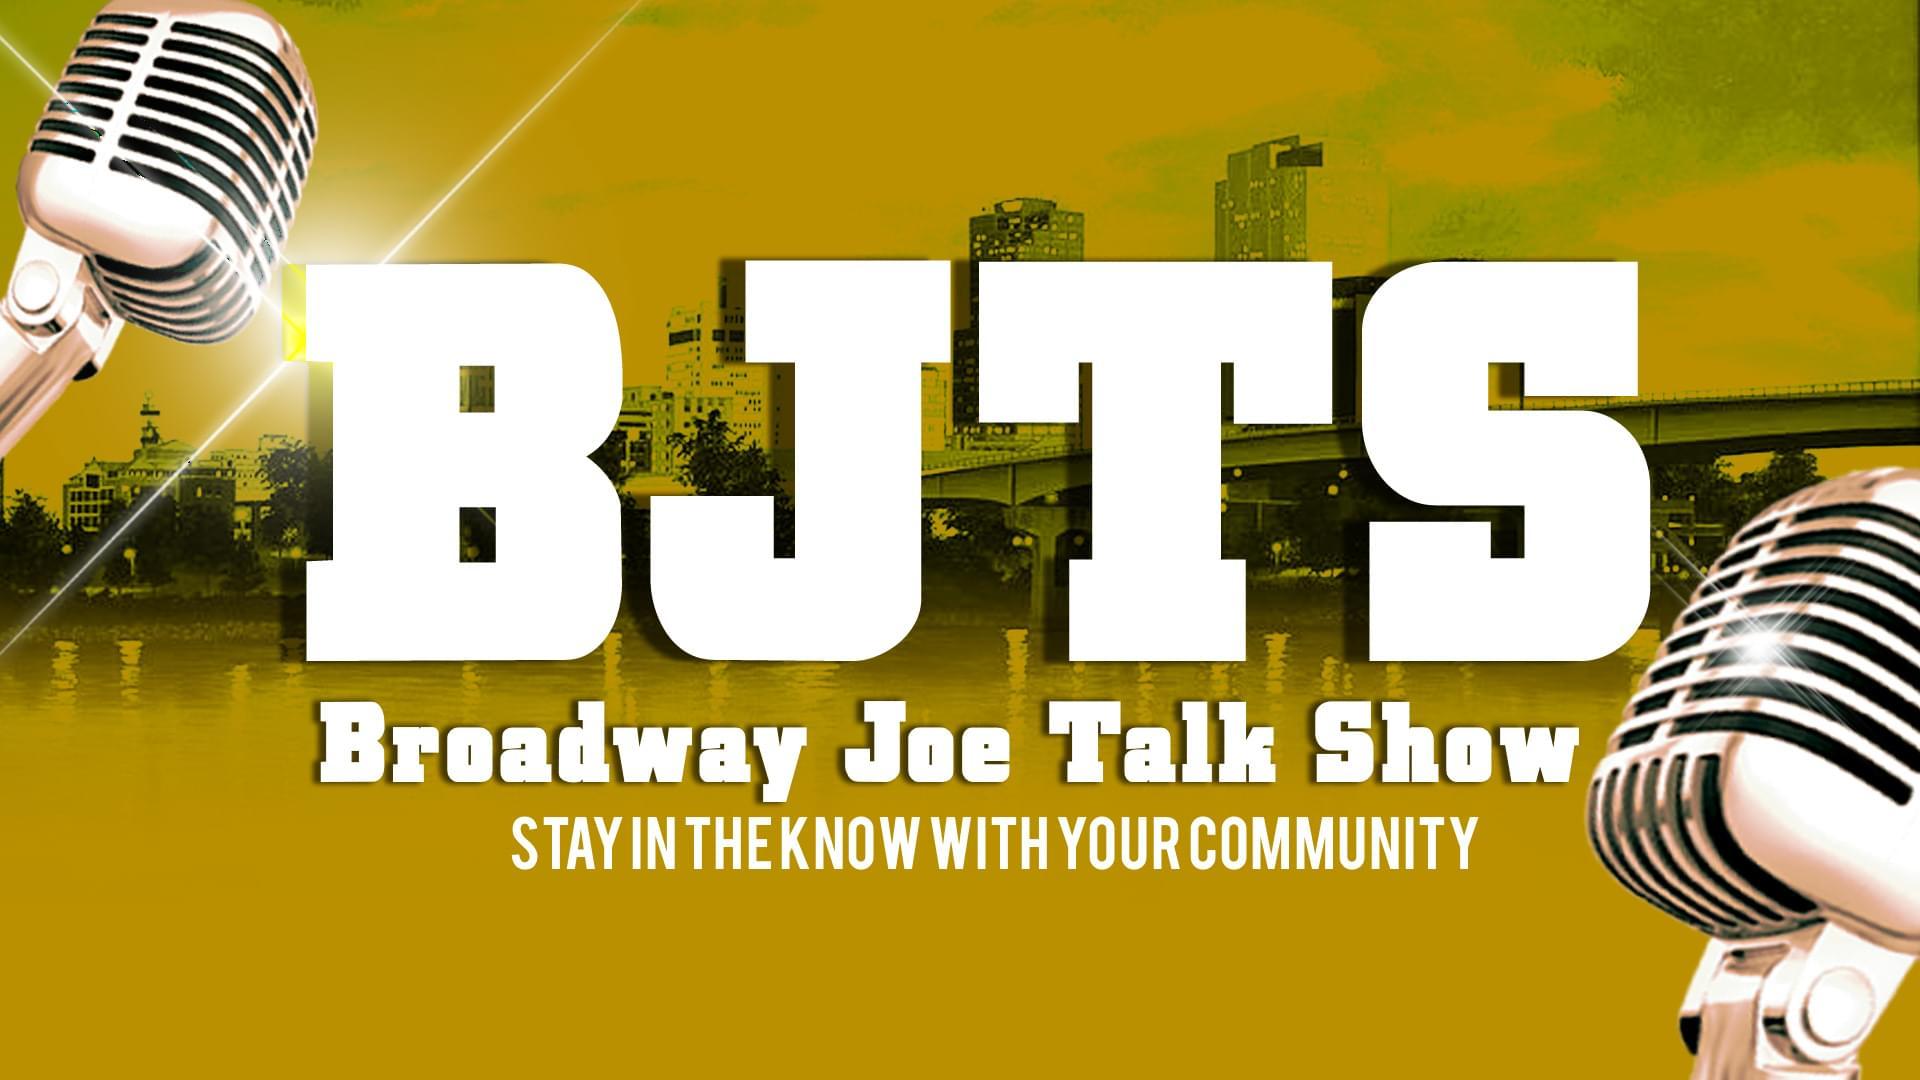 Broadway Joe Talk Show   December 5, 2019